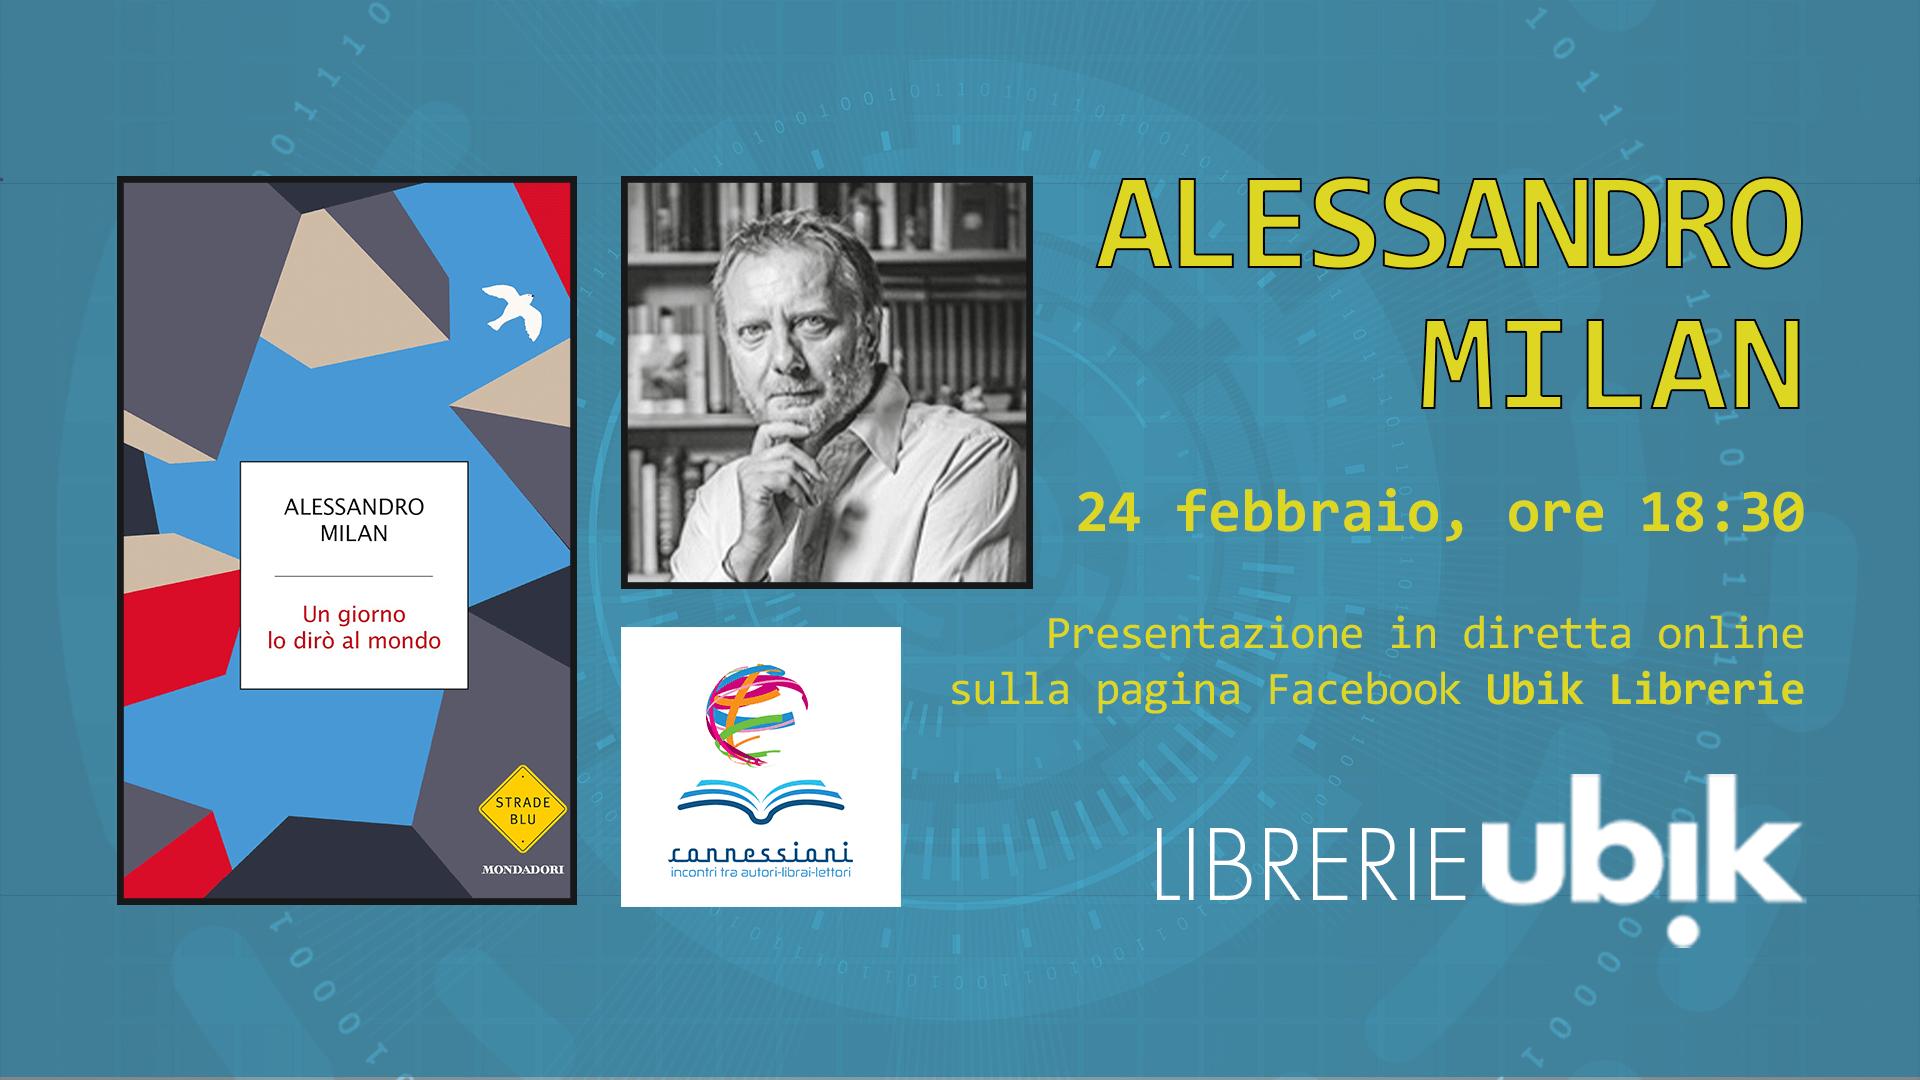 ALESSANDRO MILAN presenta